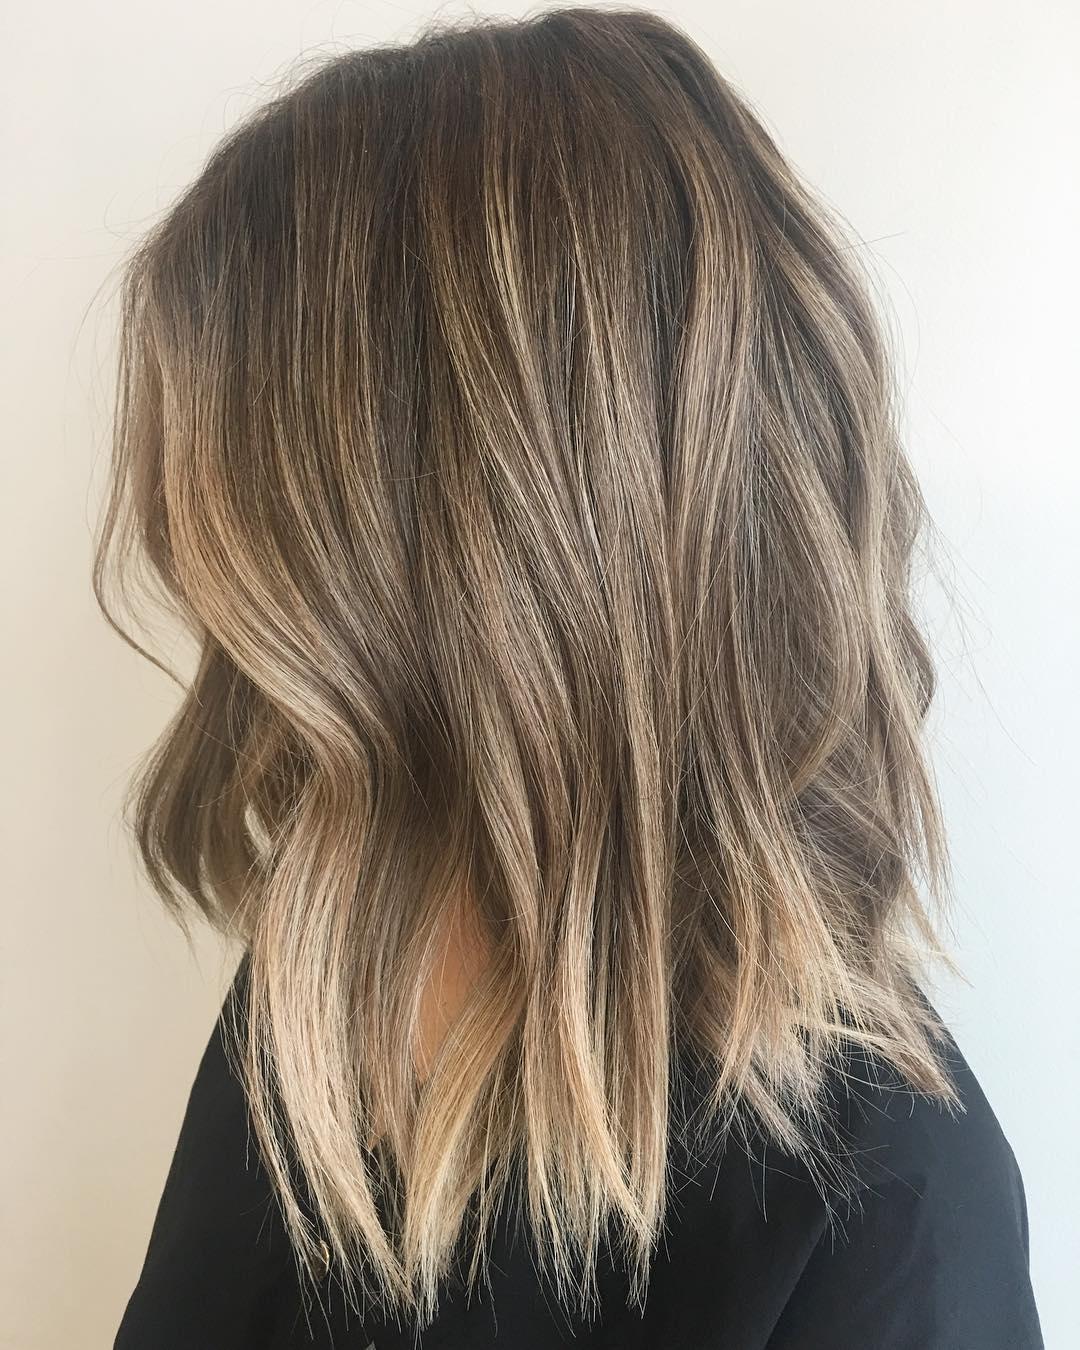 Aa ade ad medium length blonde hair balayage dark roots blonde hair balayage medium lengths